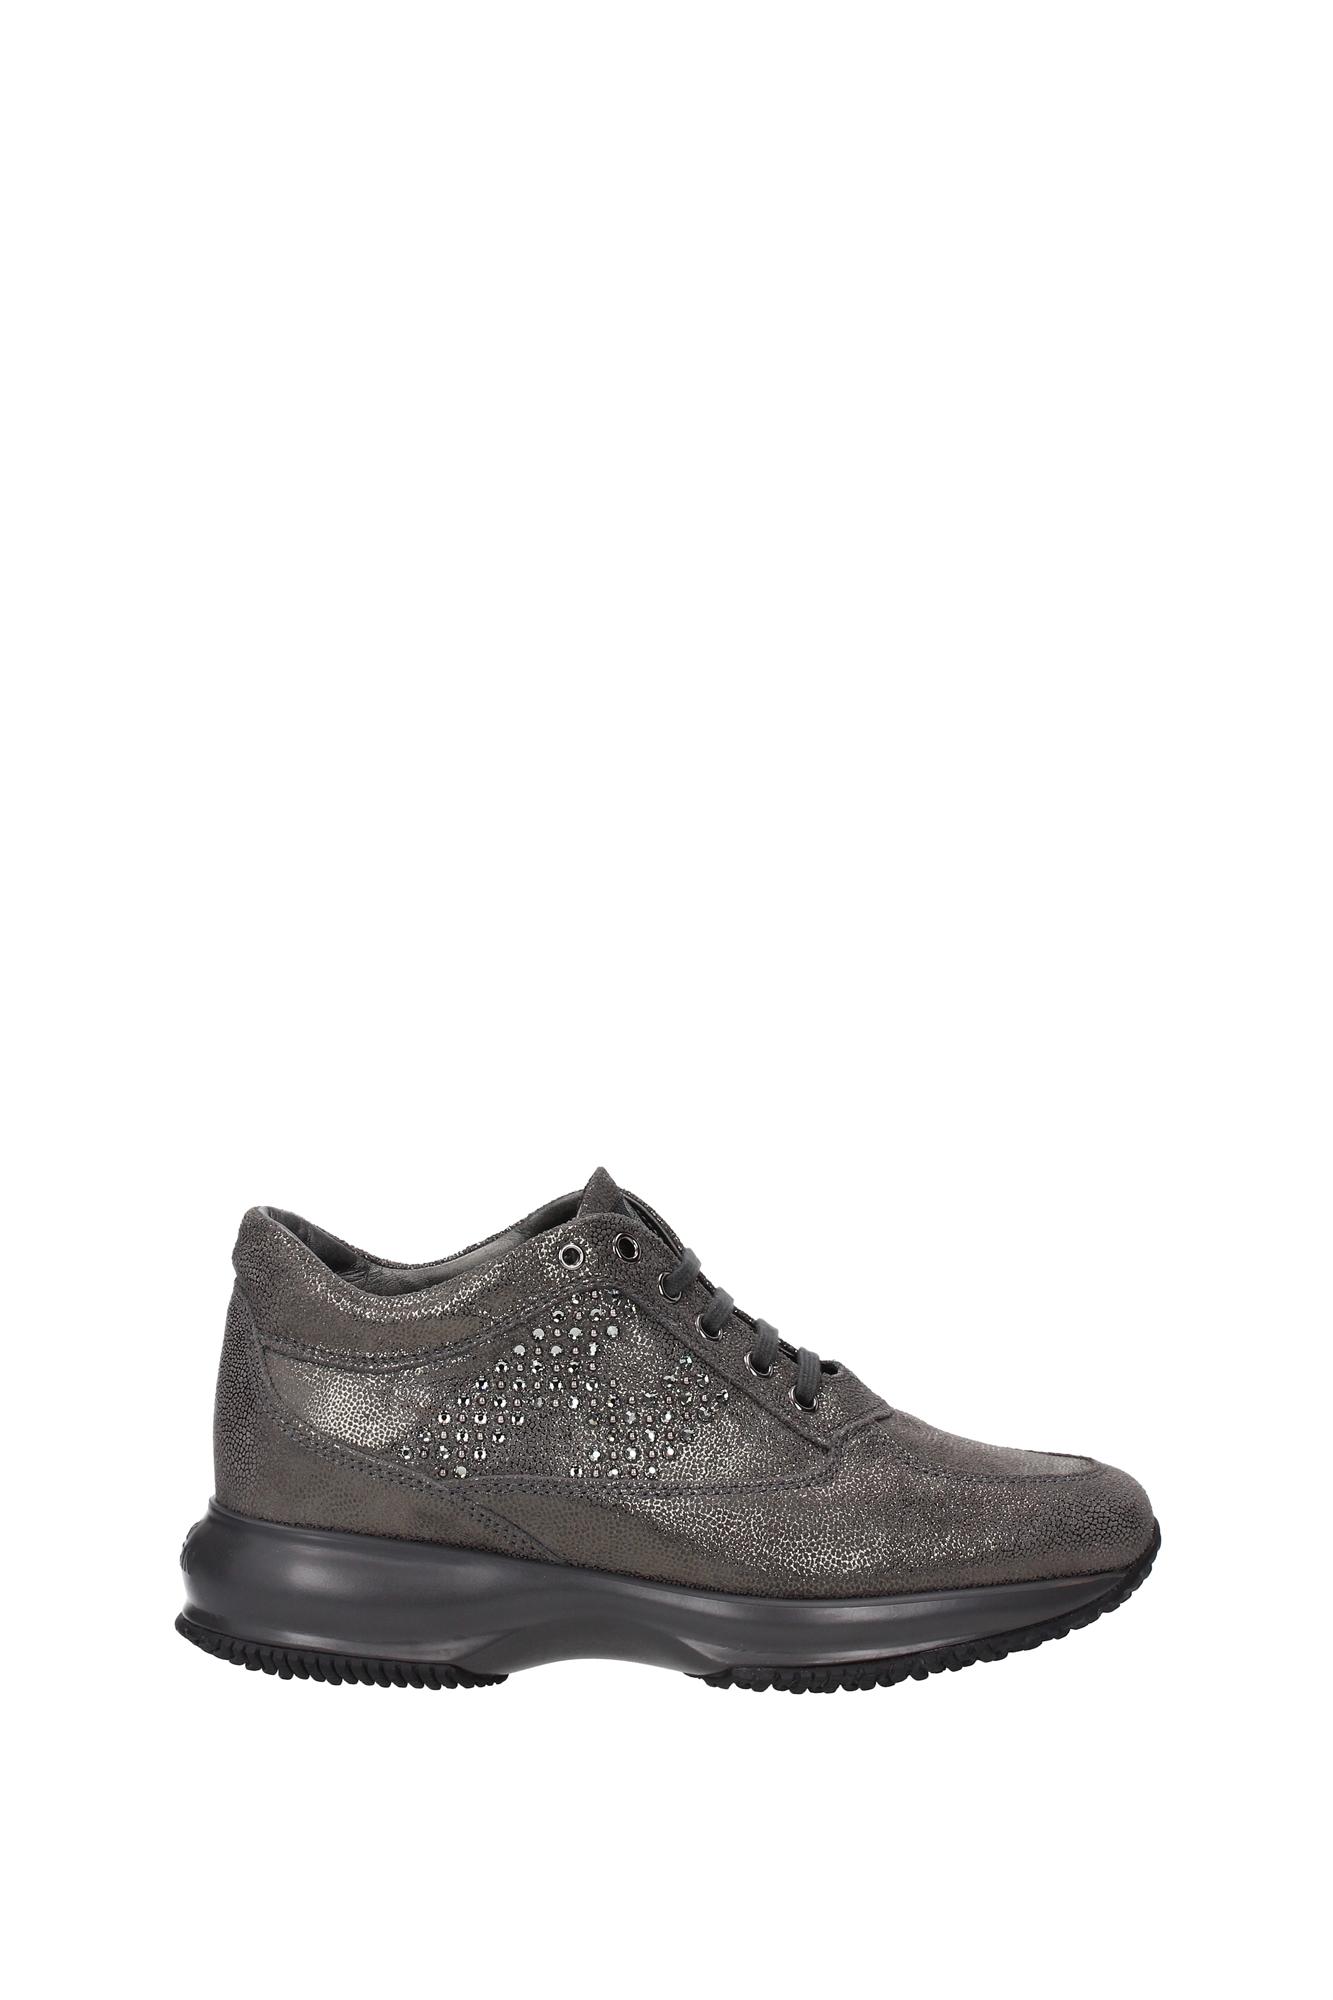 Sneakers Hogan interactive Damen - Wildleder (HXW00N0E4306QIB800)